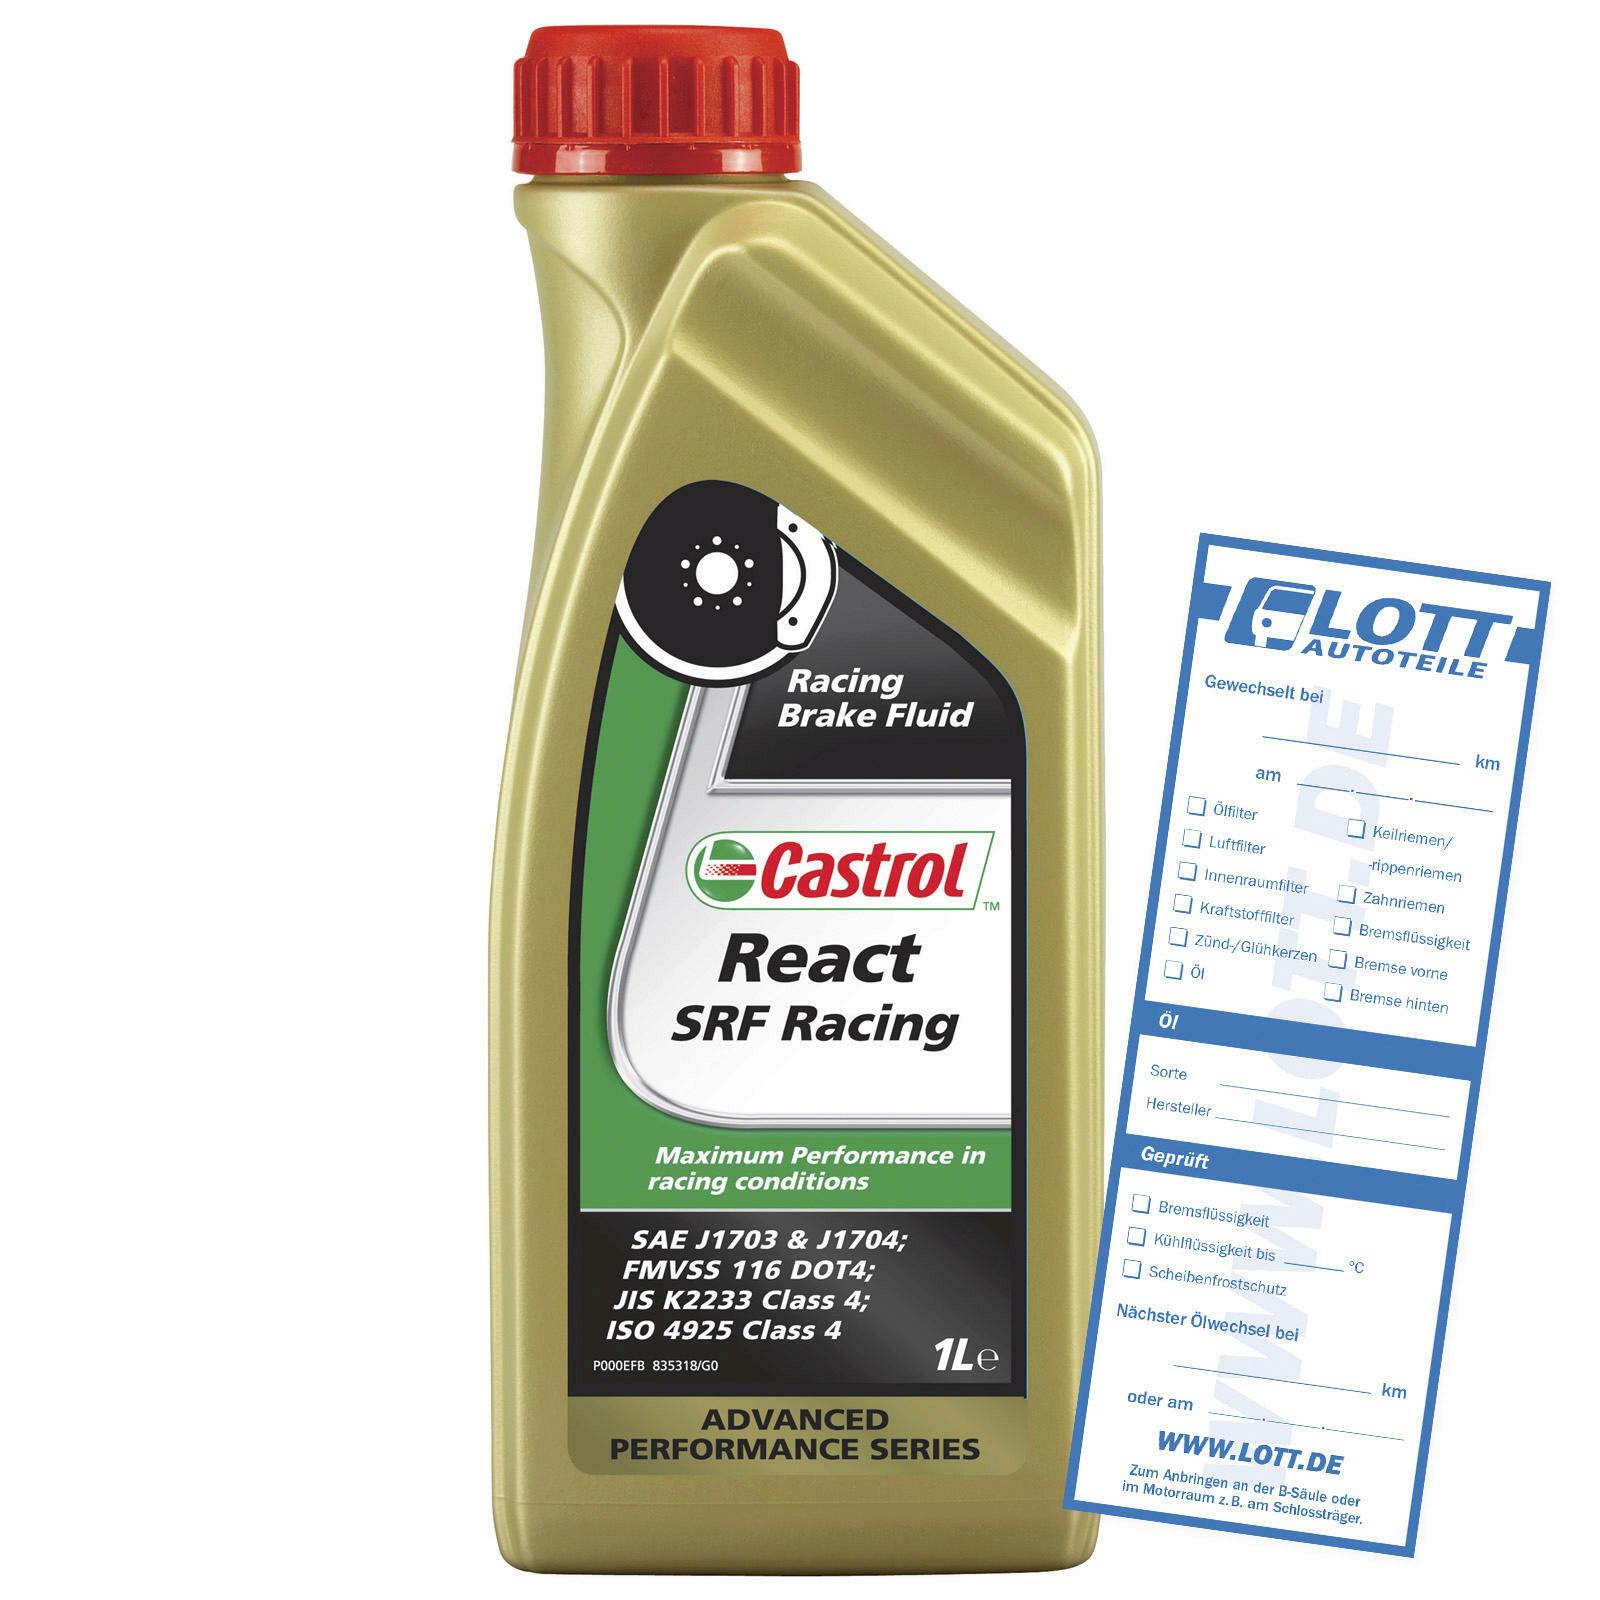 CASTROL Bremsflüssigkeit React SRF Racing 1L